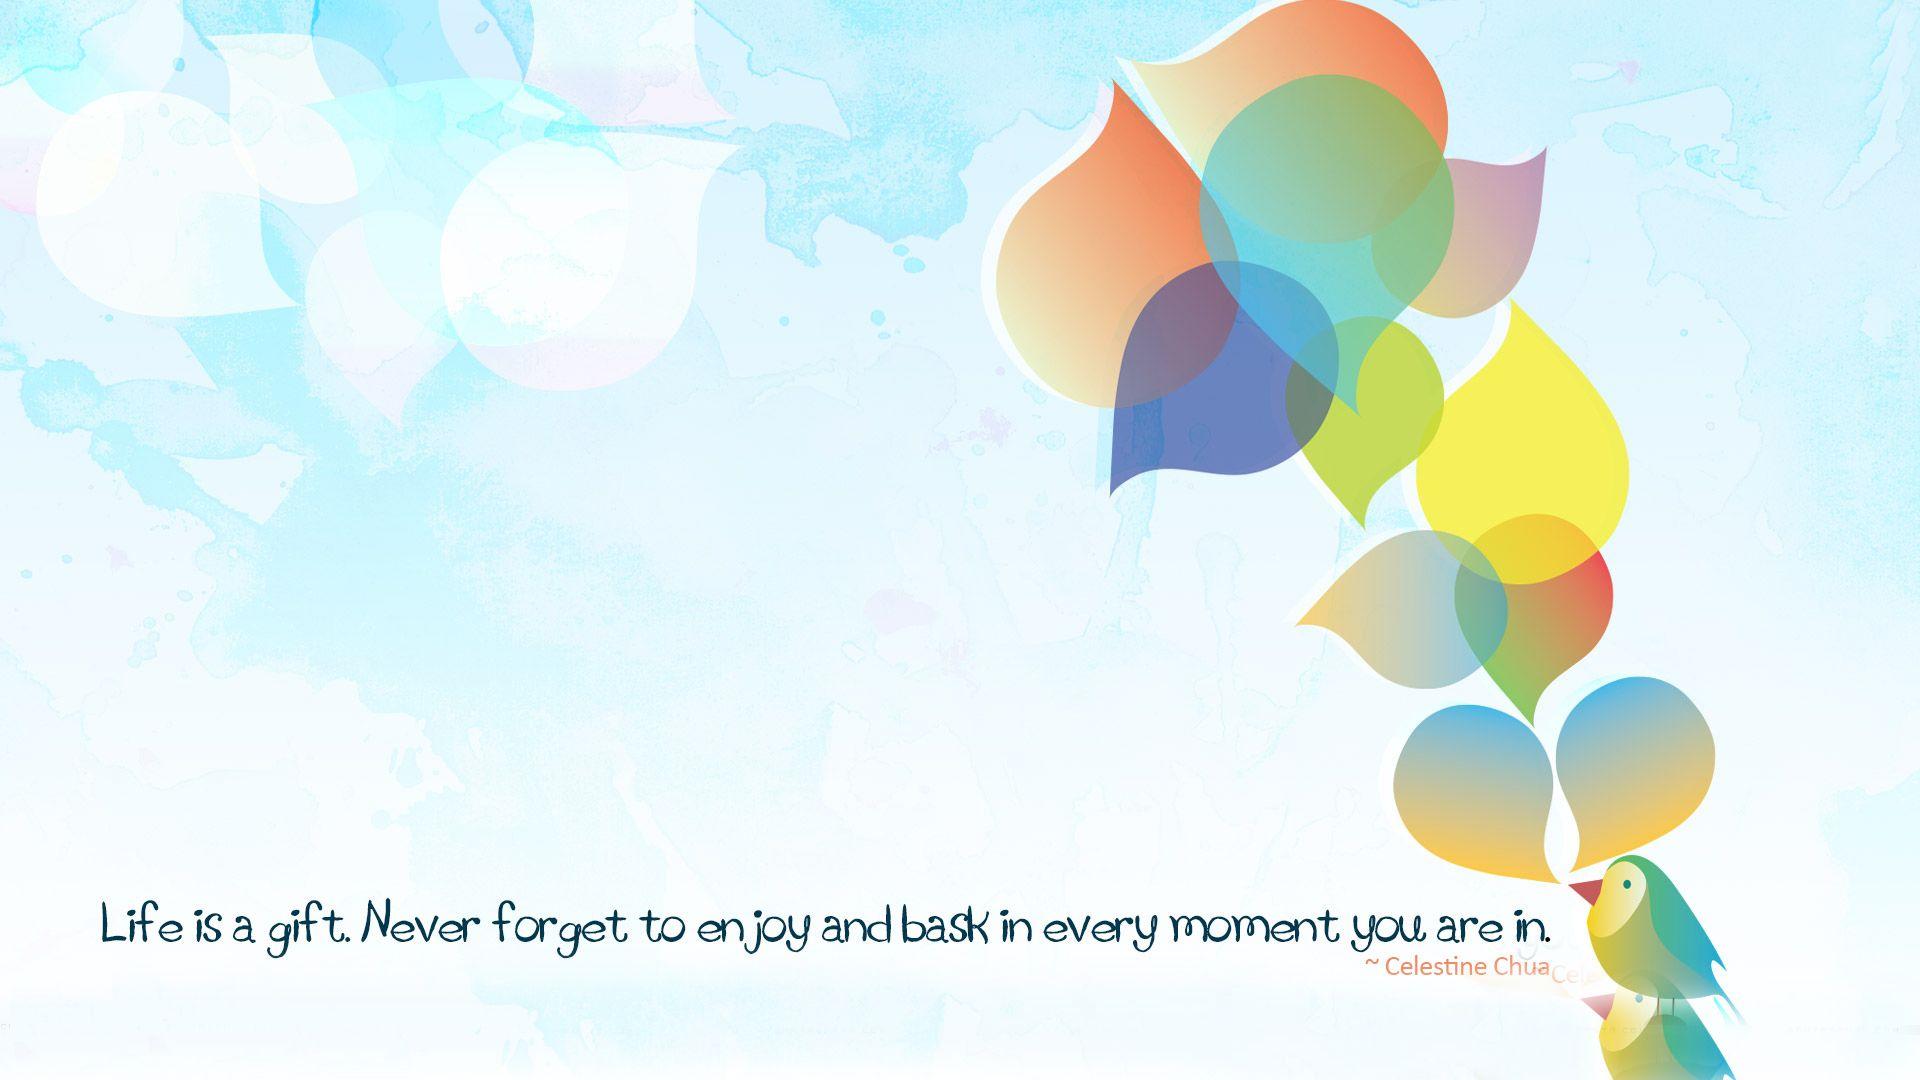 Love Inspiring Quotes Wallpaper Inspirational Wallpapers For Desktop Cute Motivational